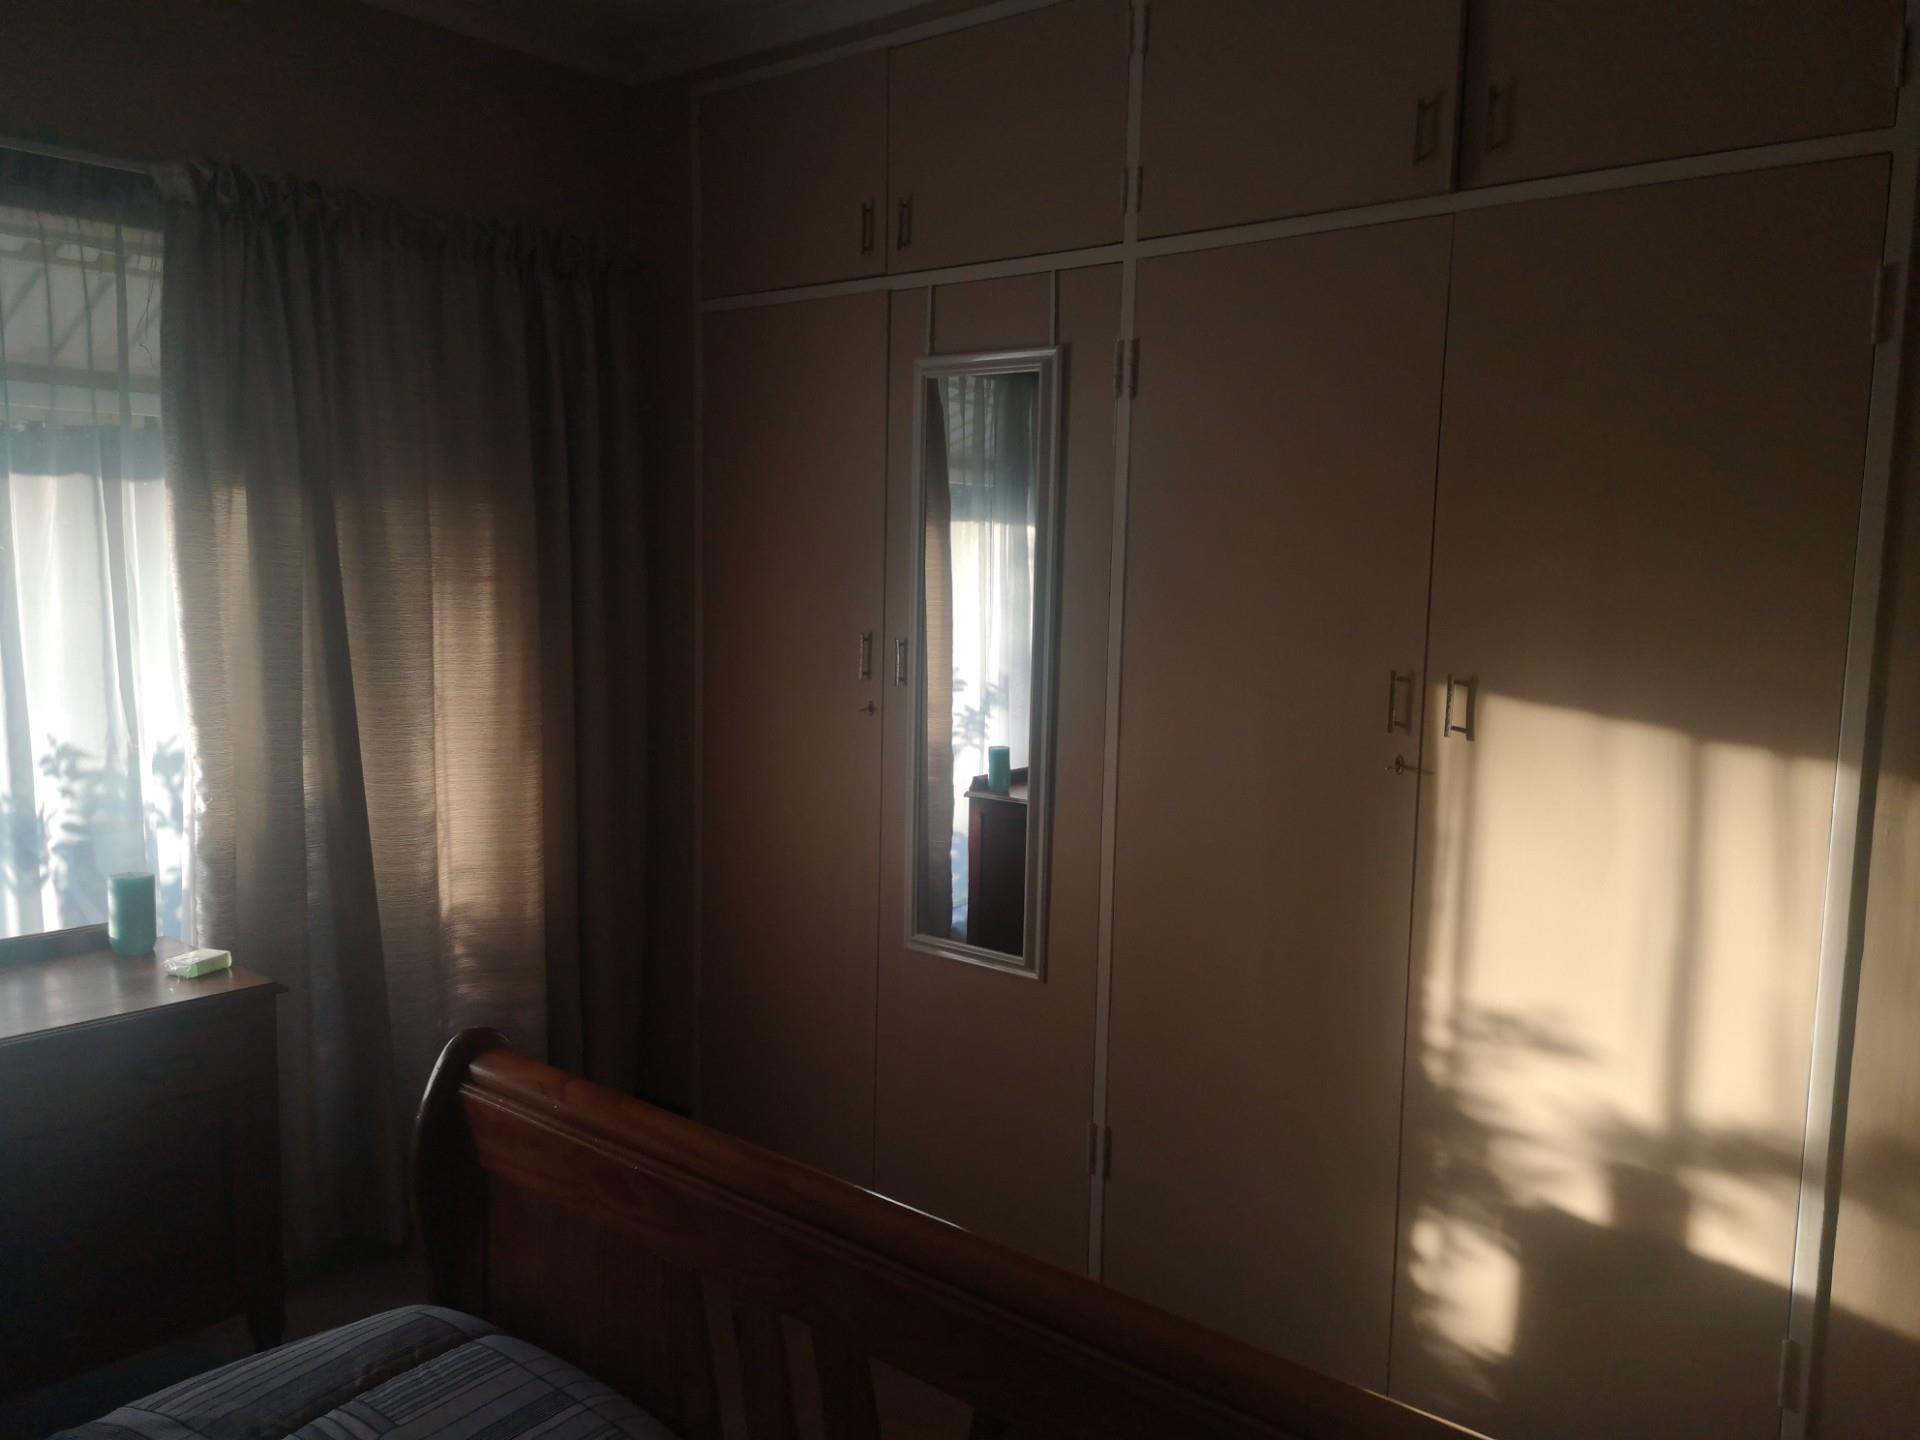 3 Bedroom House For Sale in Kanonkop